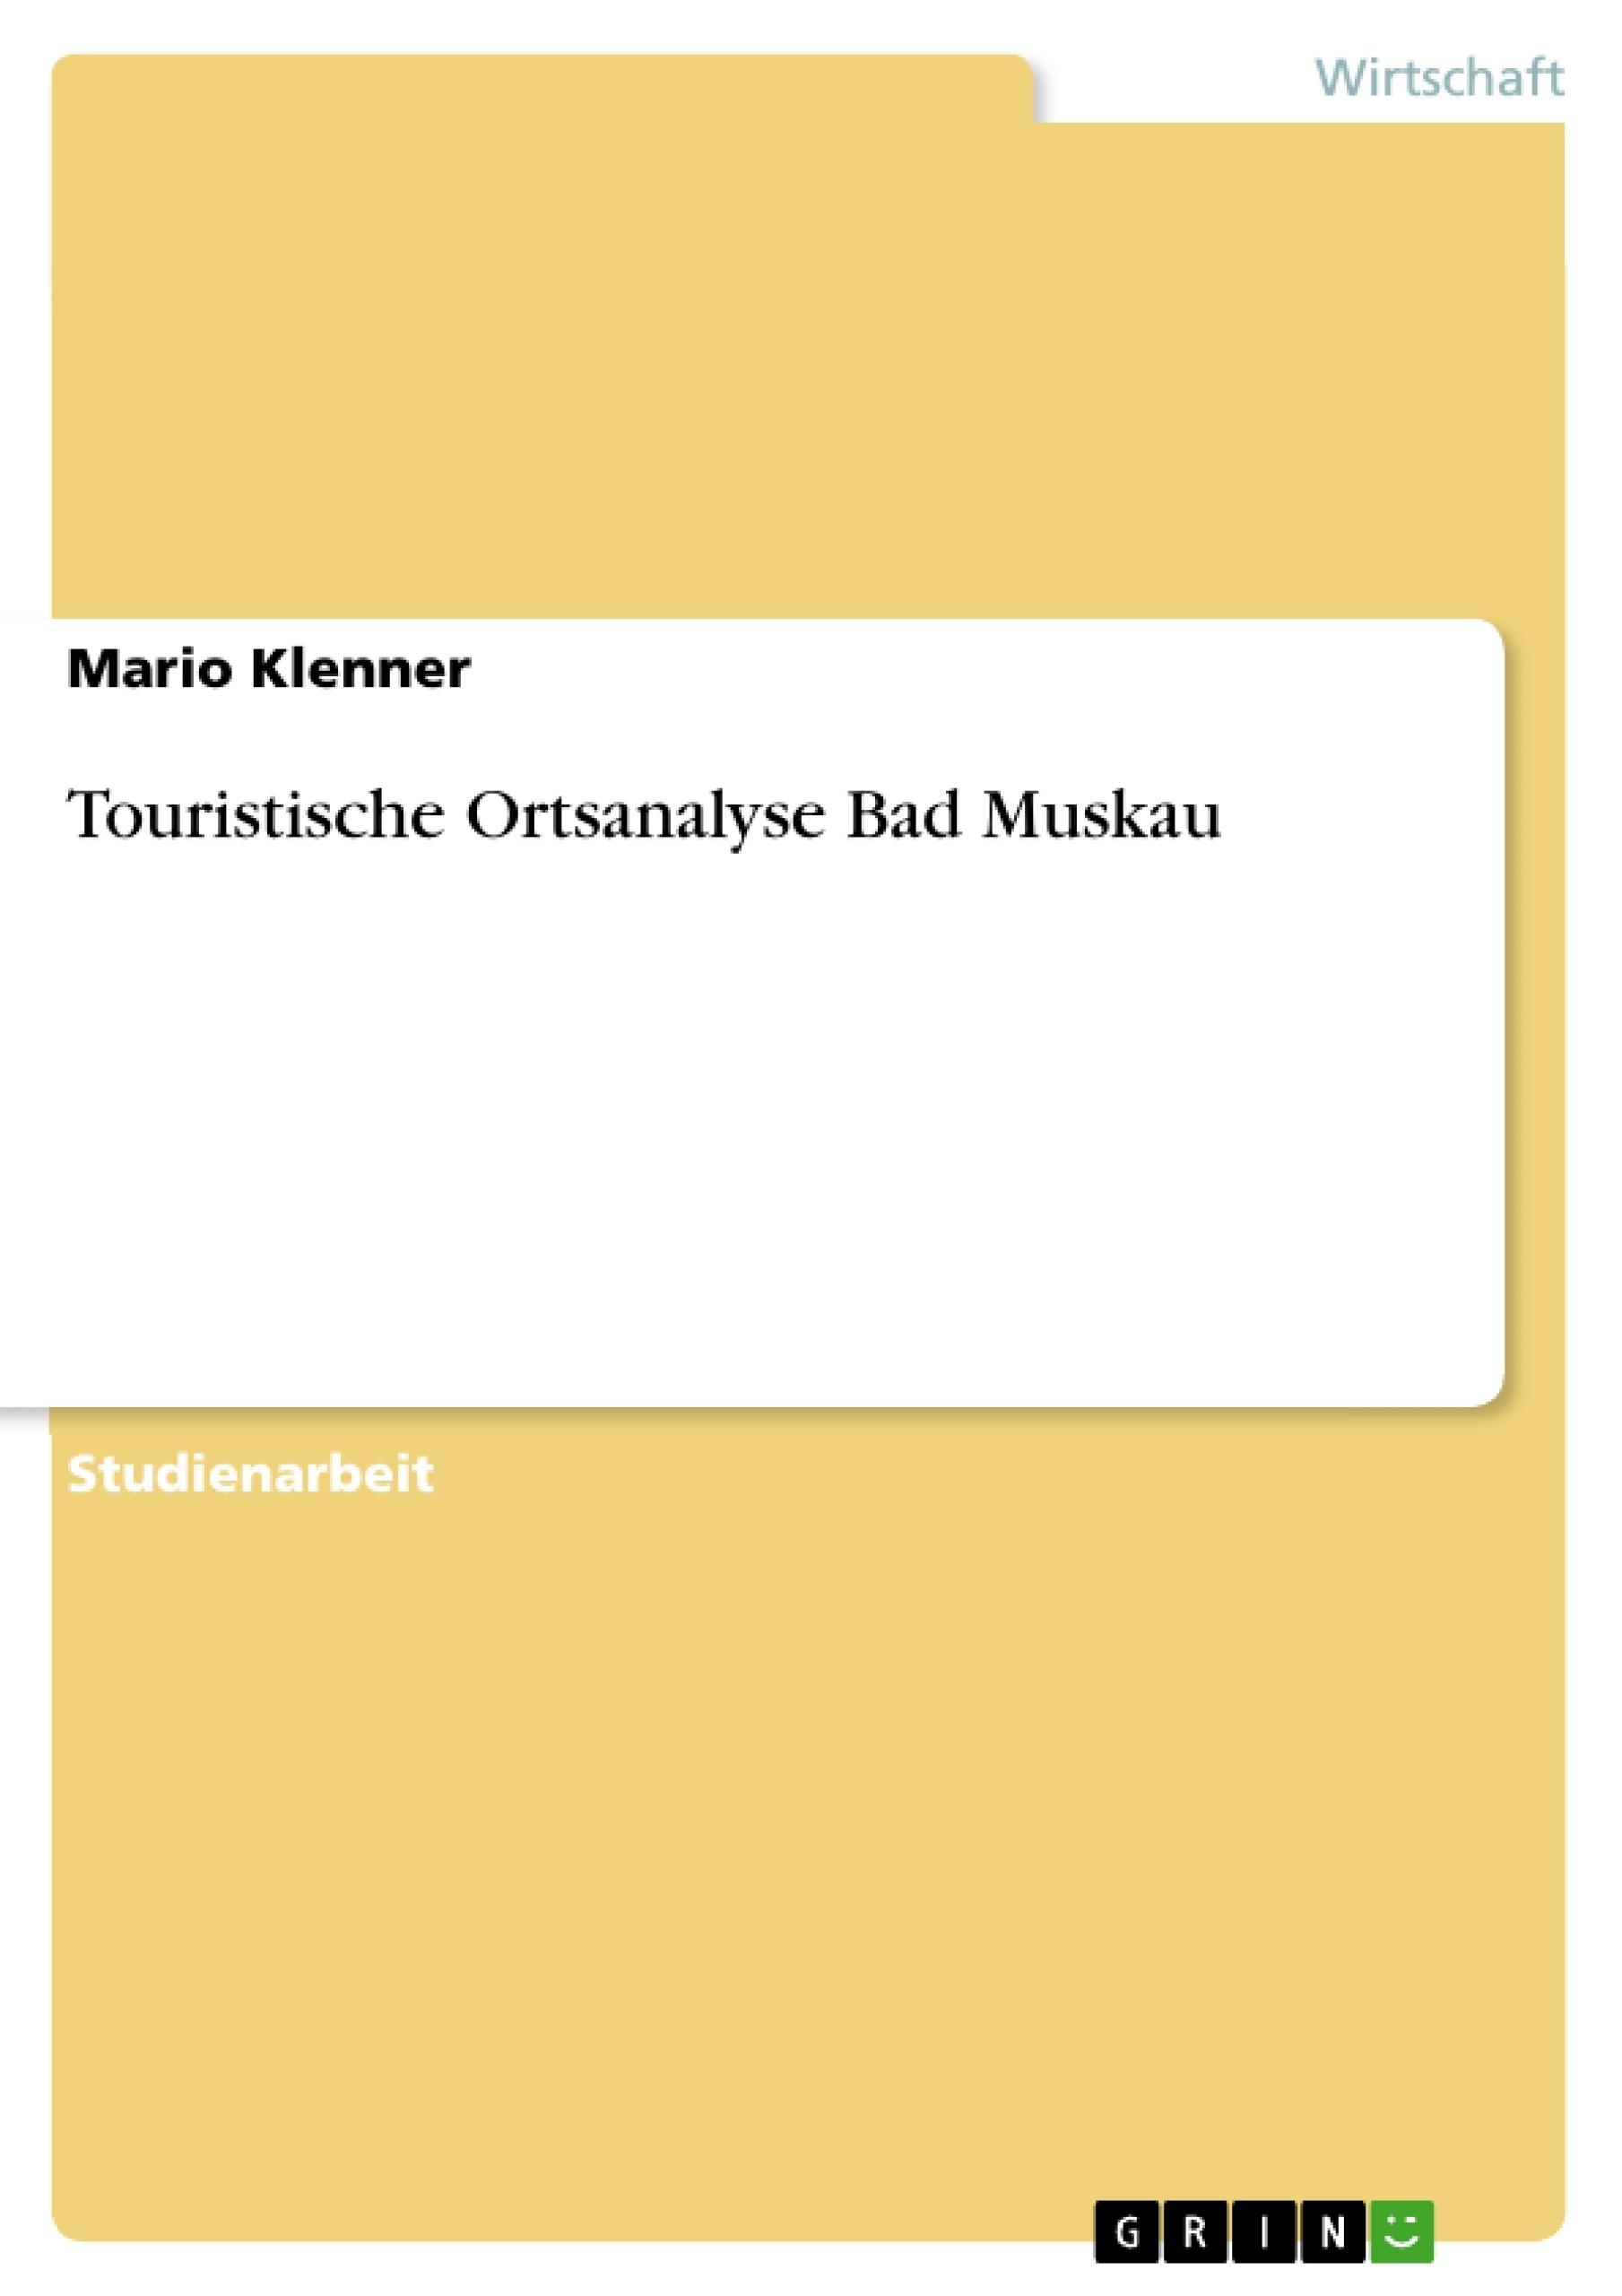 Titel: Touristische Ortsanalyse Bad Muskau